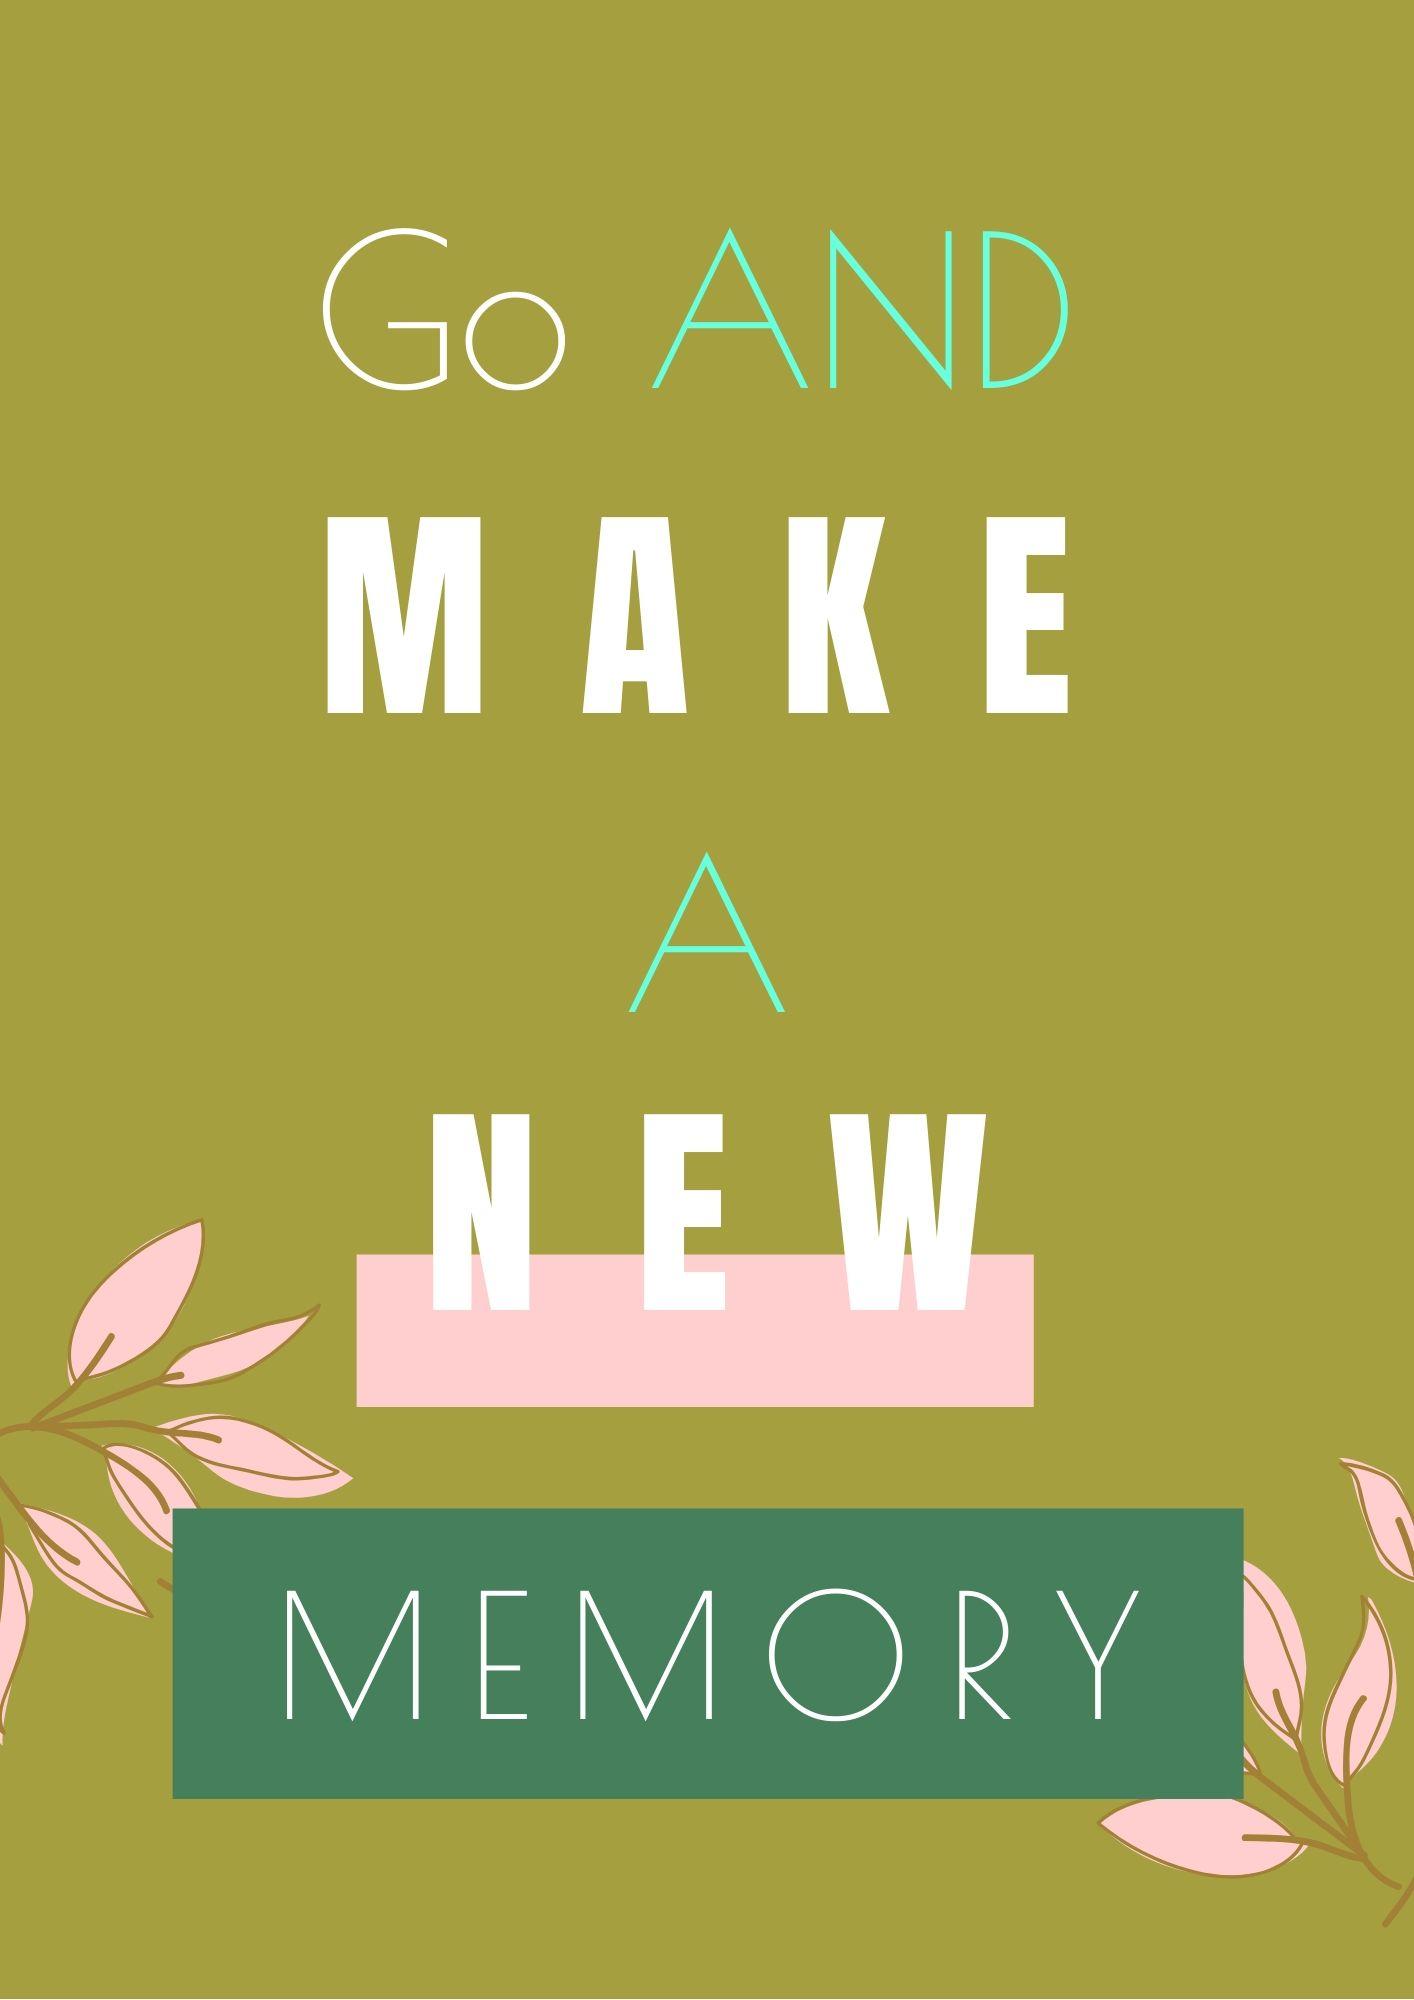 go and make a new memory inspirational graphics